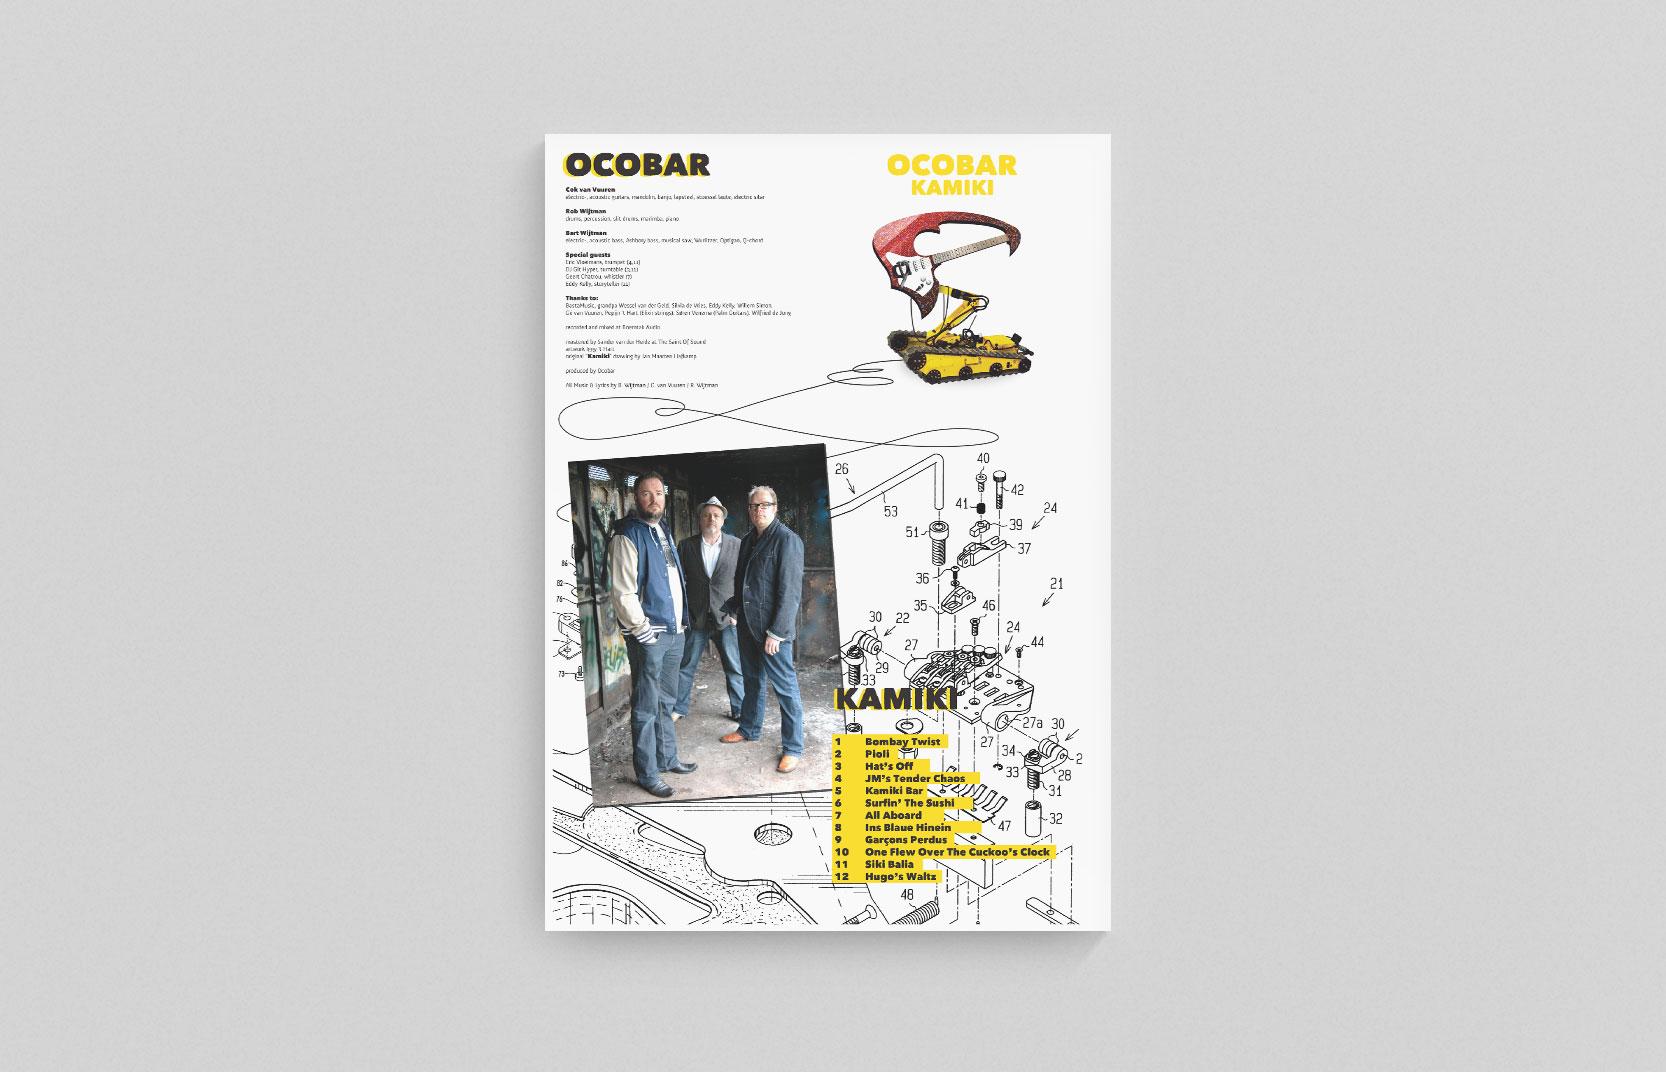 drukwerk_ocobarkamiki_blad